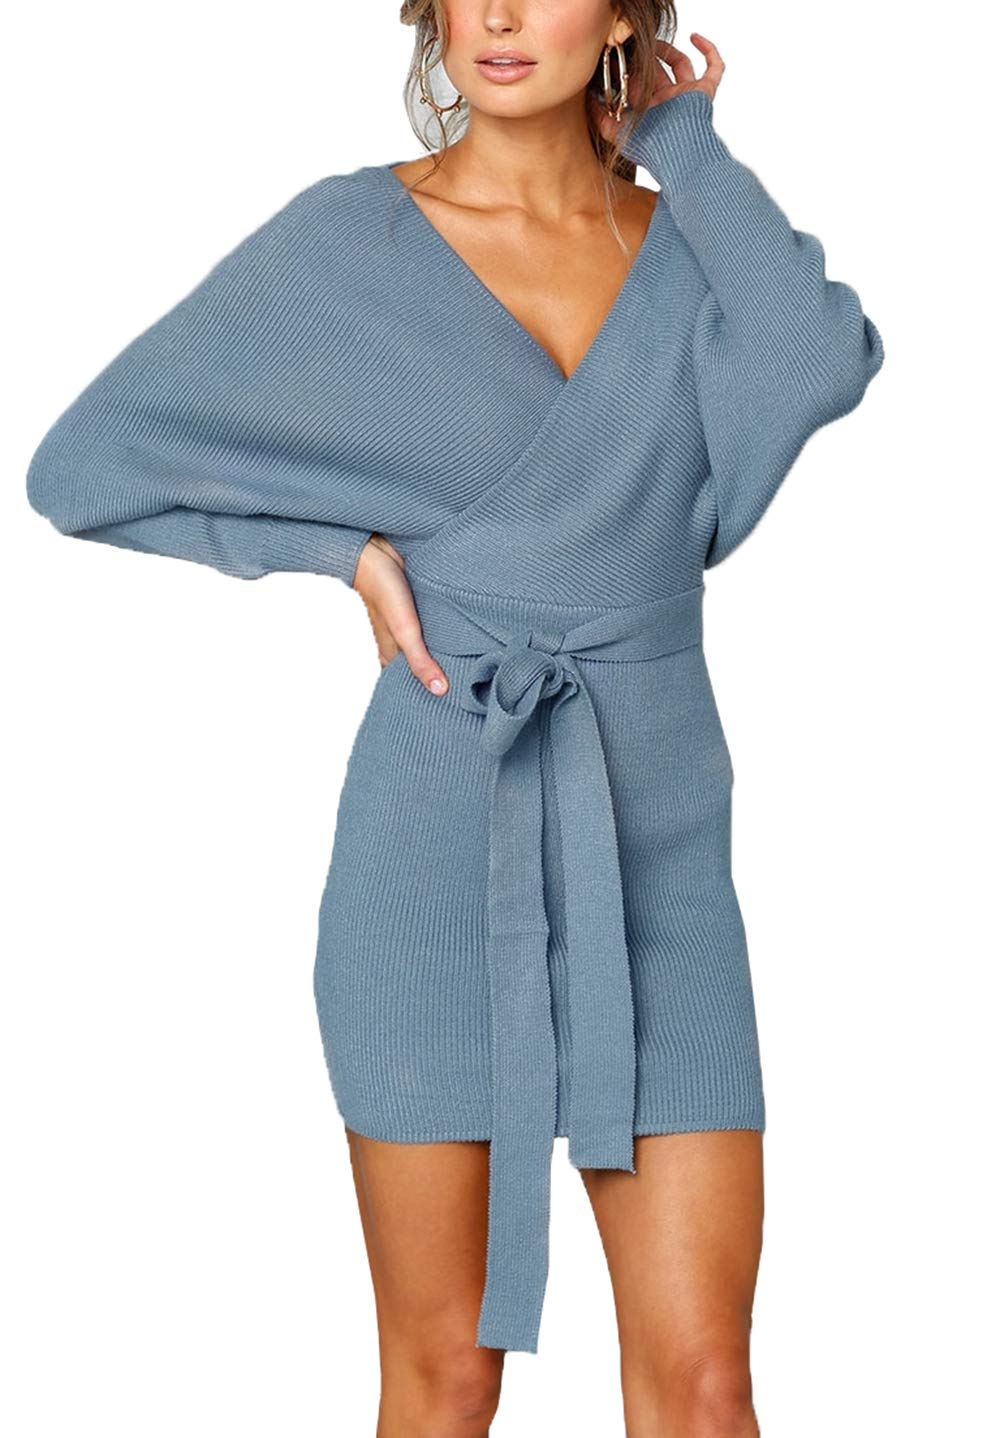 Suimiki Women's Sexy V Neck Wrap Backless Bodycon Pencil Dress